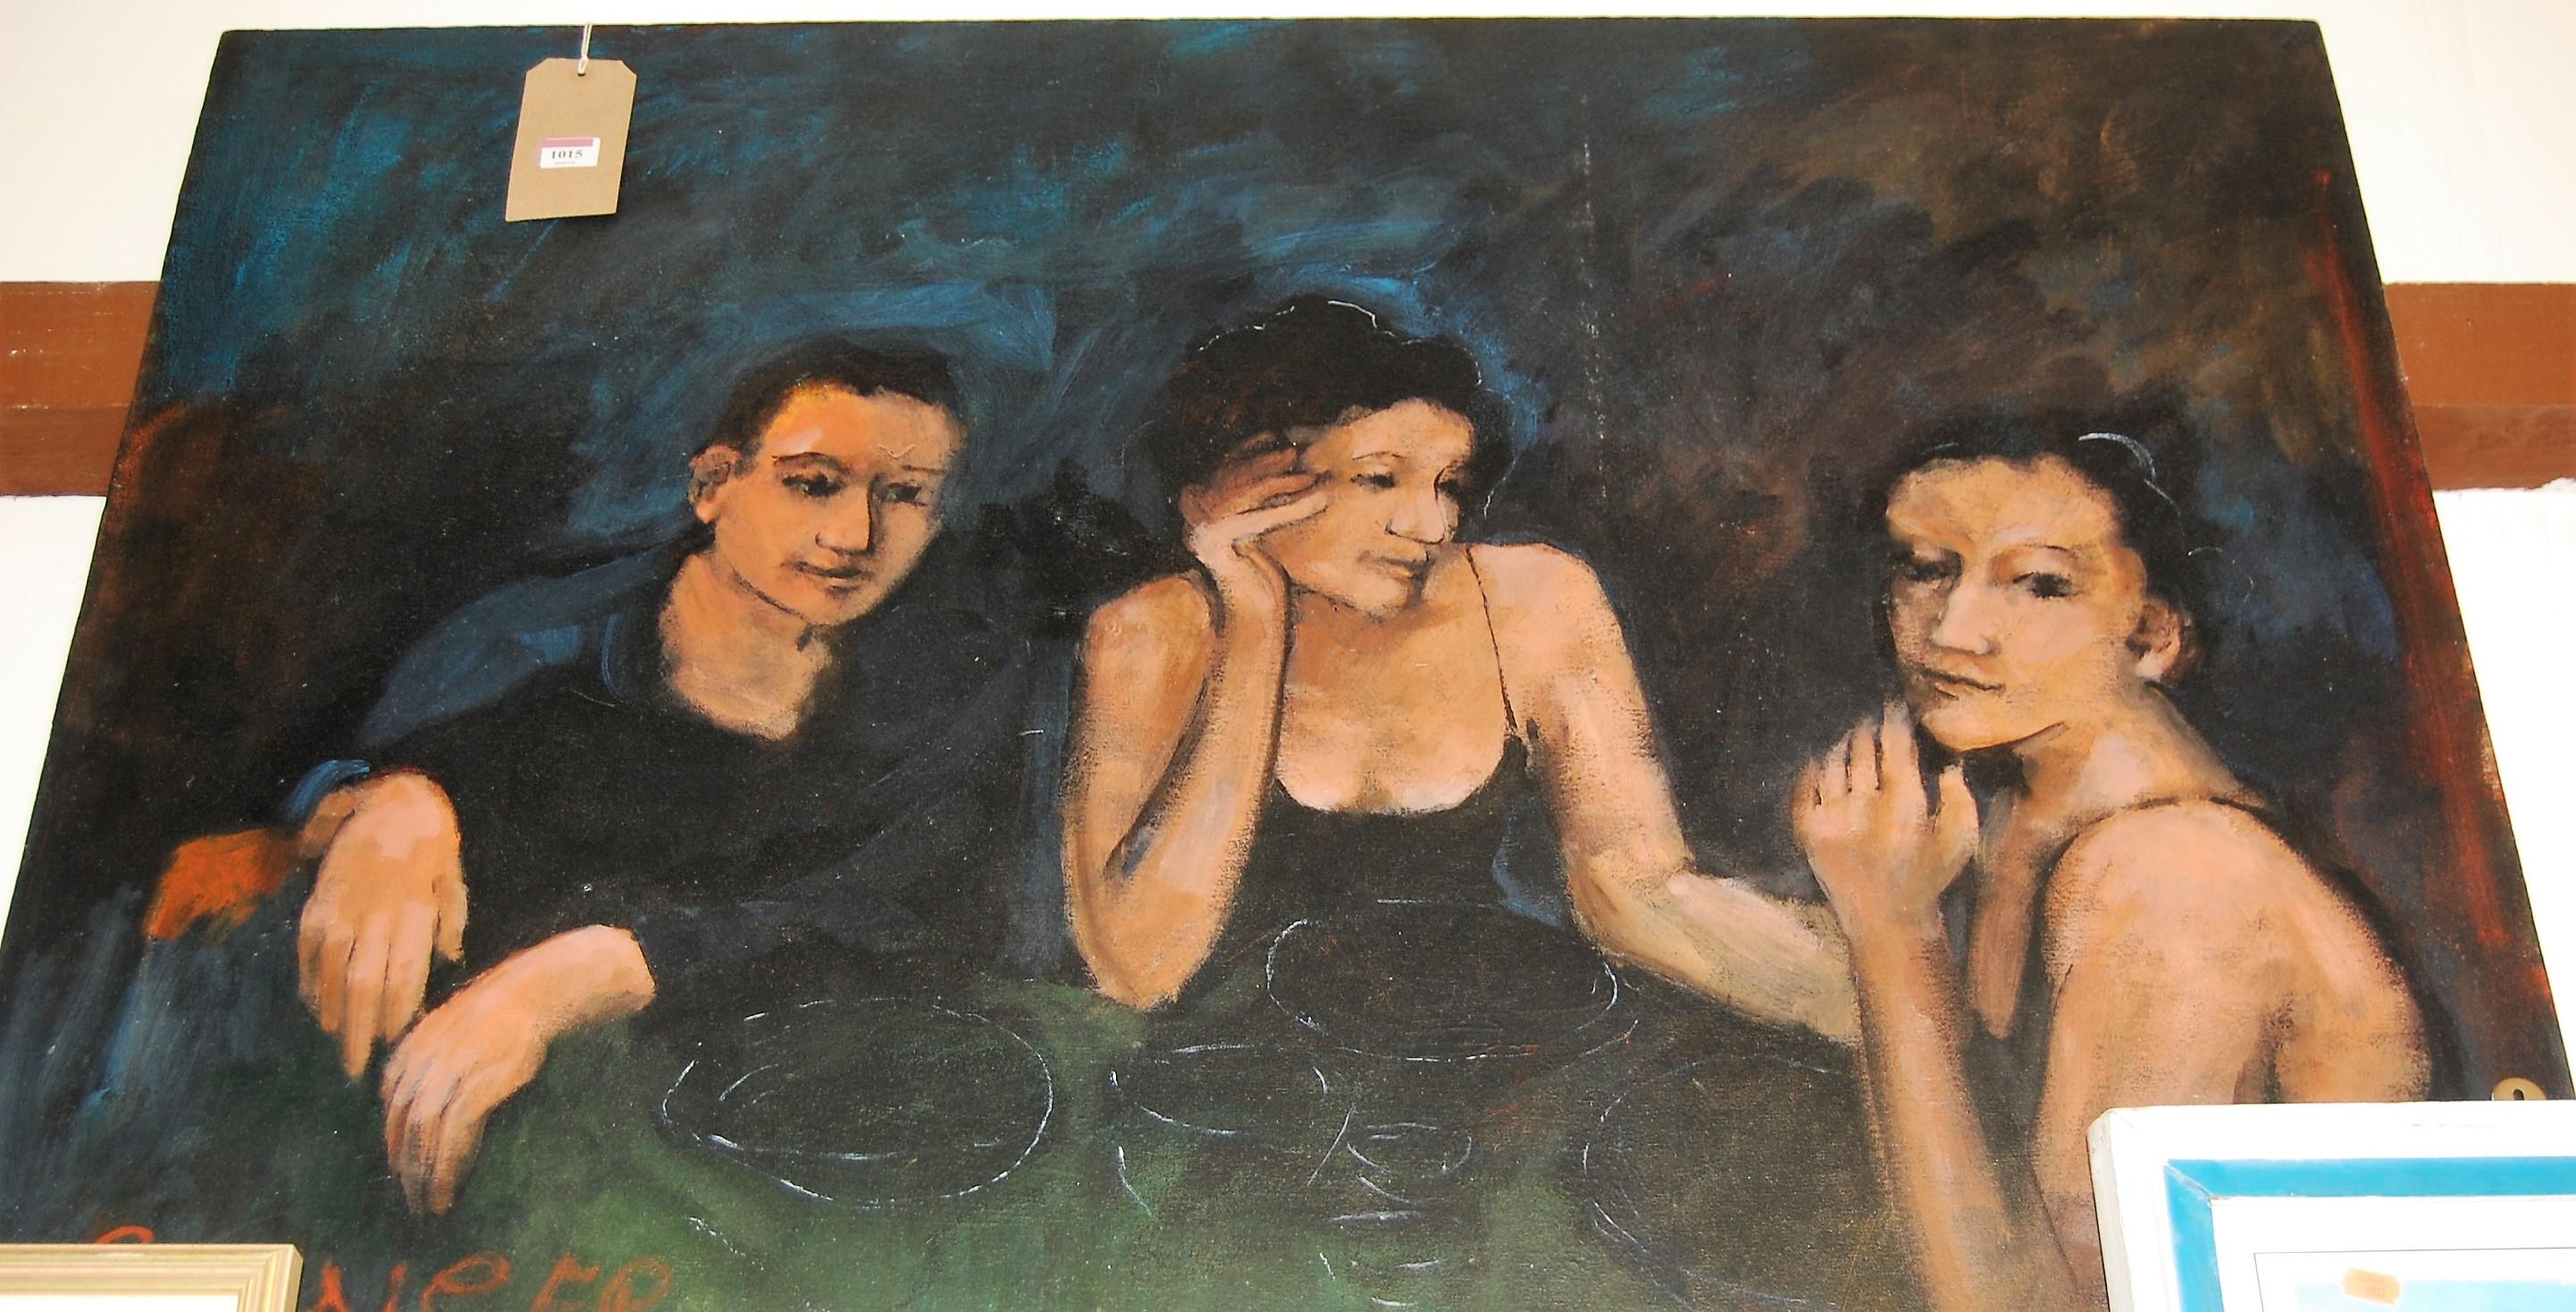 Lot 1015 - Grainger - Untitled, oil on canvas, 88 x 118cm